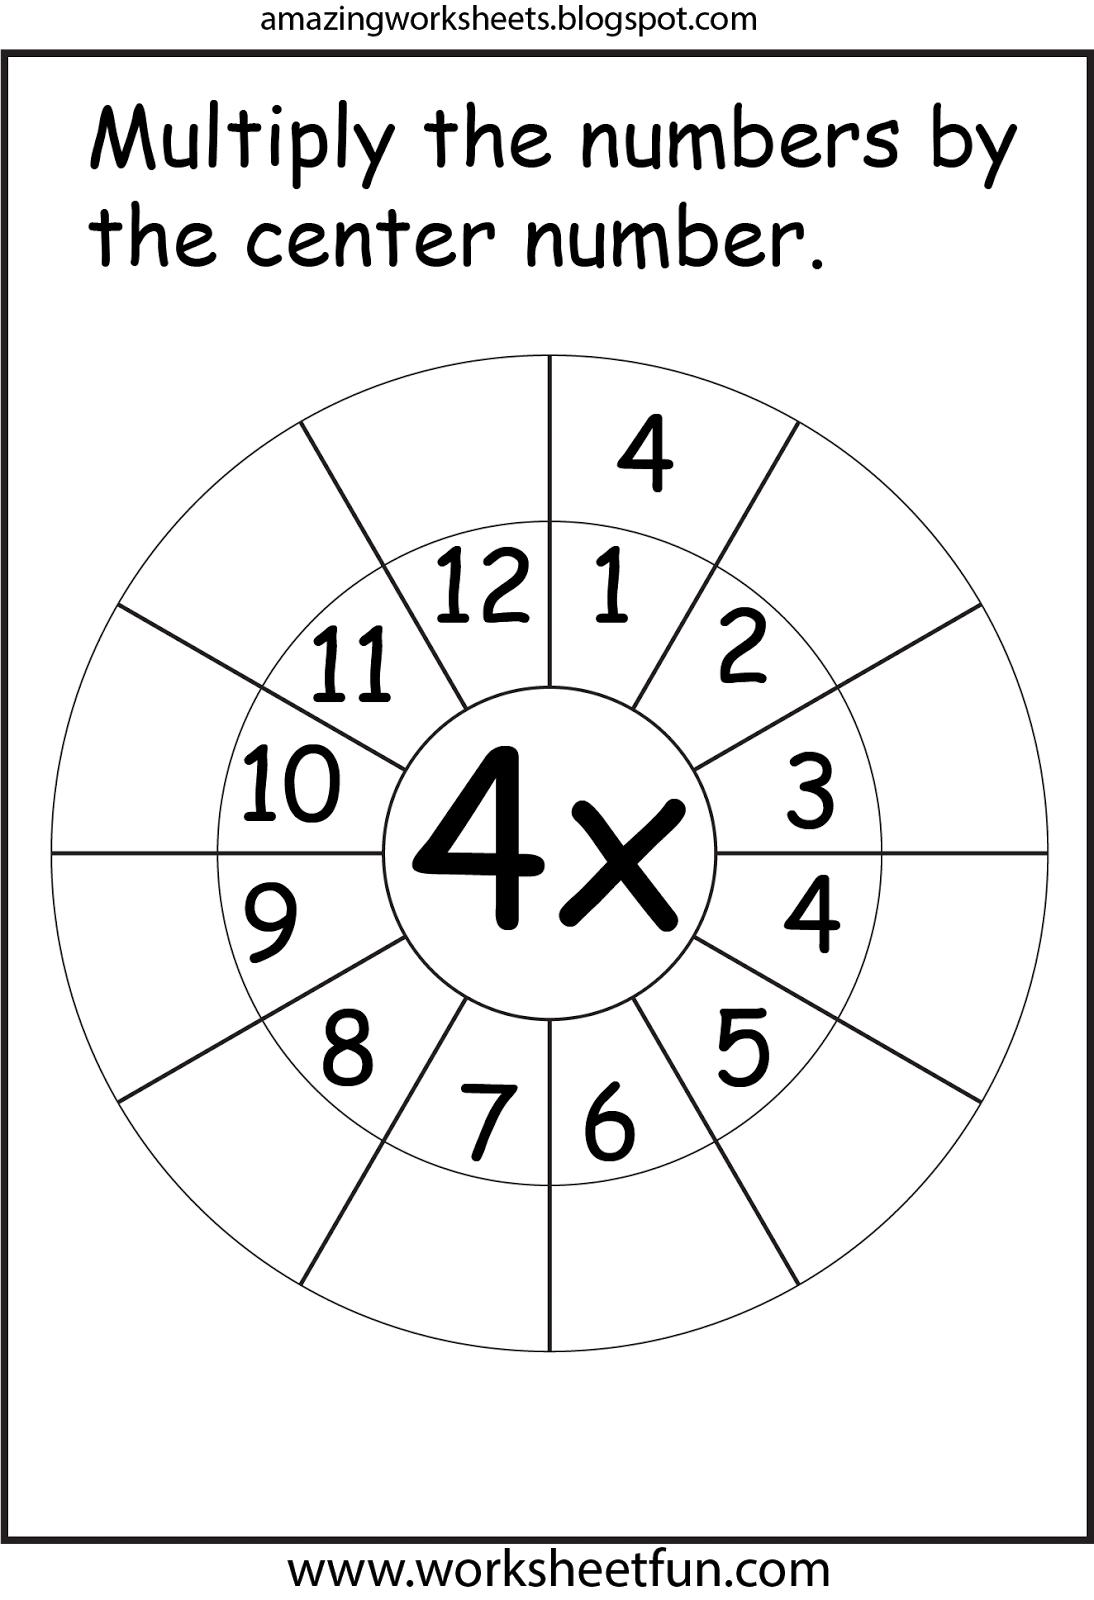 4 times table | Maths ideas | Pinterest | Math, Numeracy and School